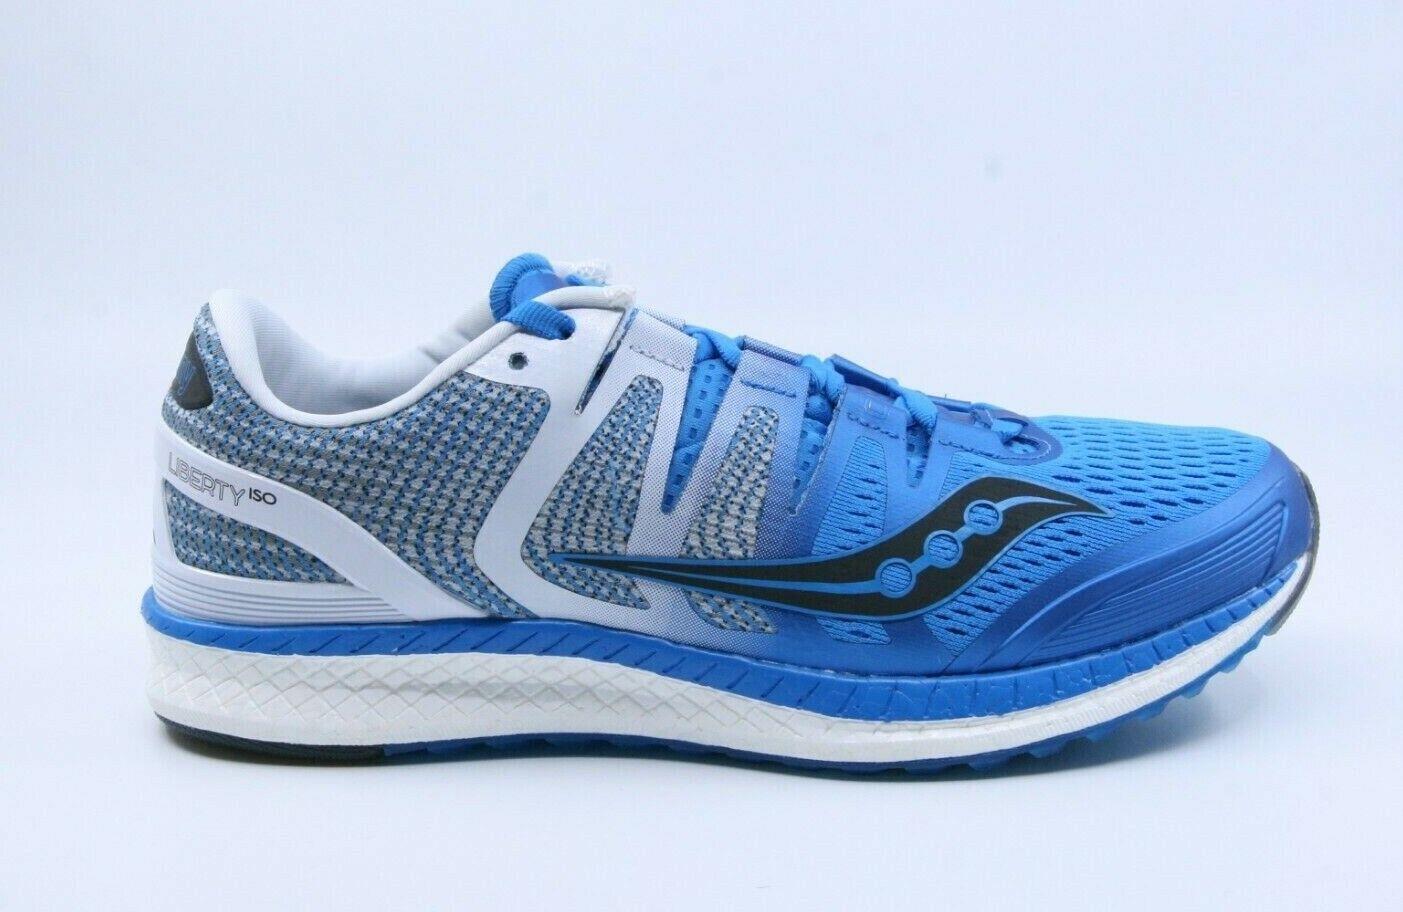 Saucony hombre S20410-2 Azul blancoo negro liberto ISO tenis de correr